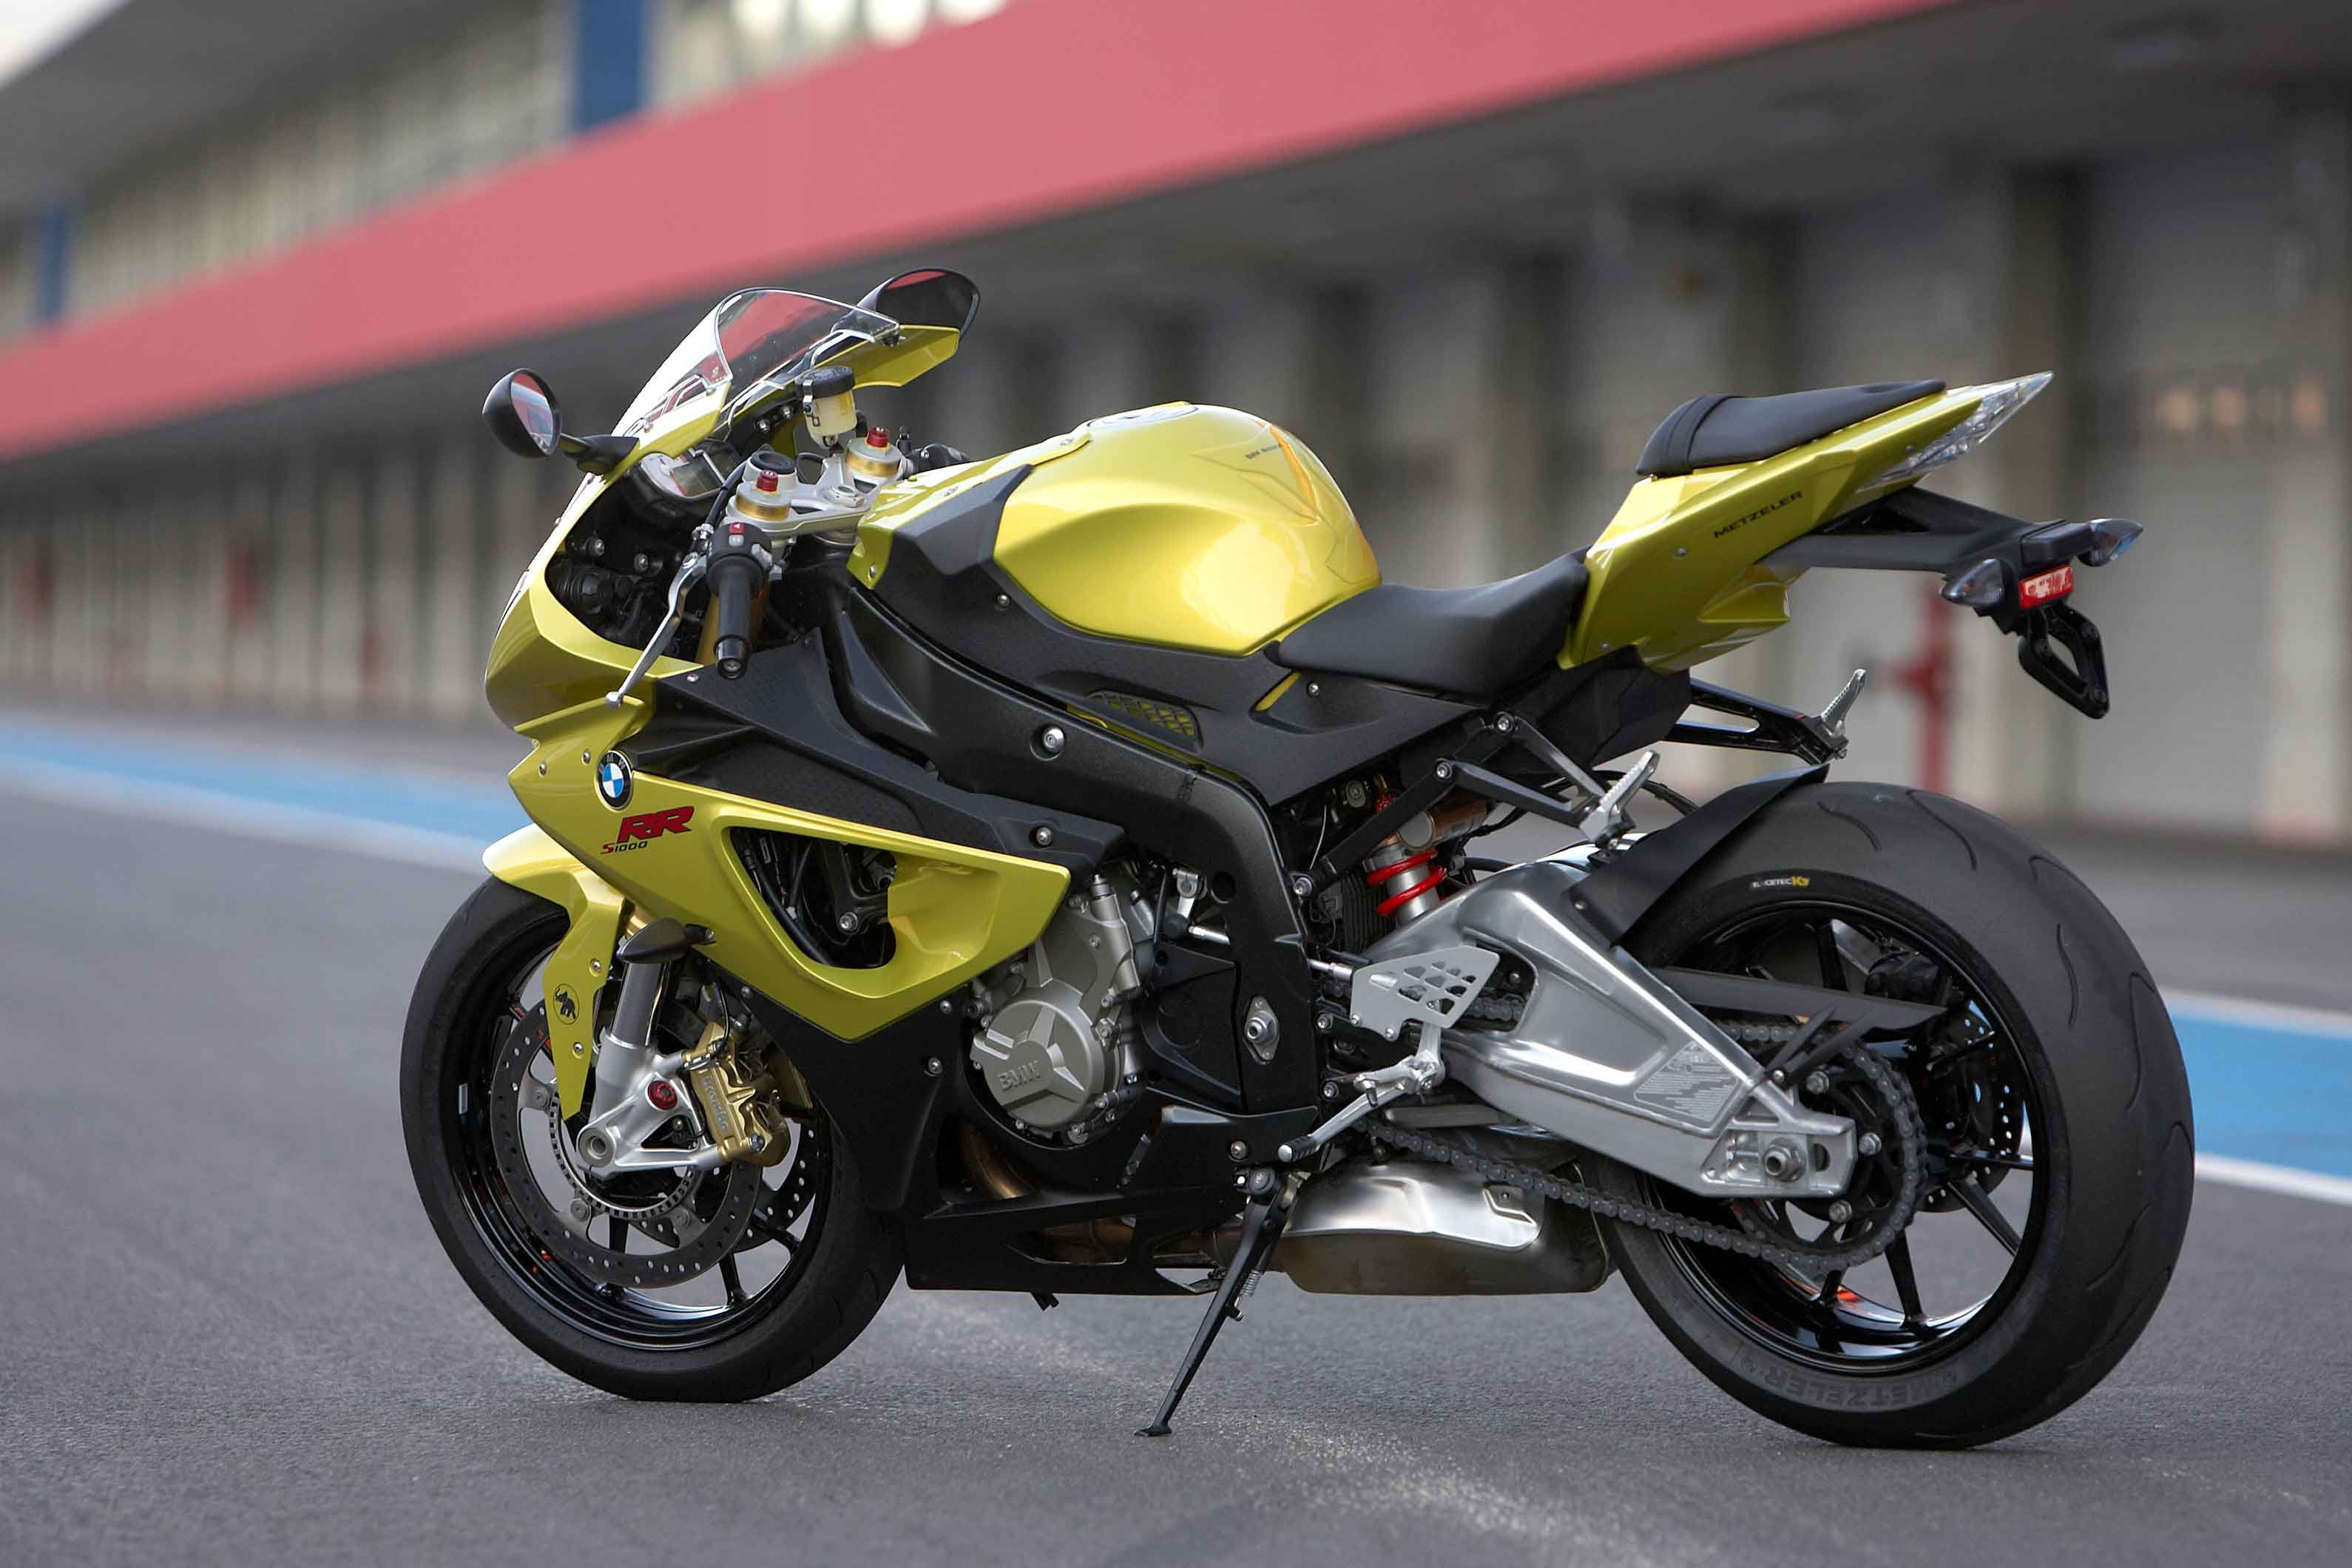 sport motorcycles wallpapers photos | fotos de motos | pinterest